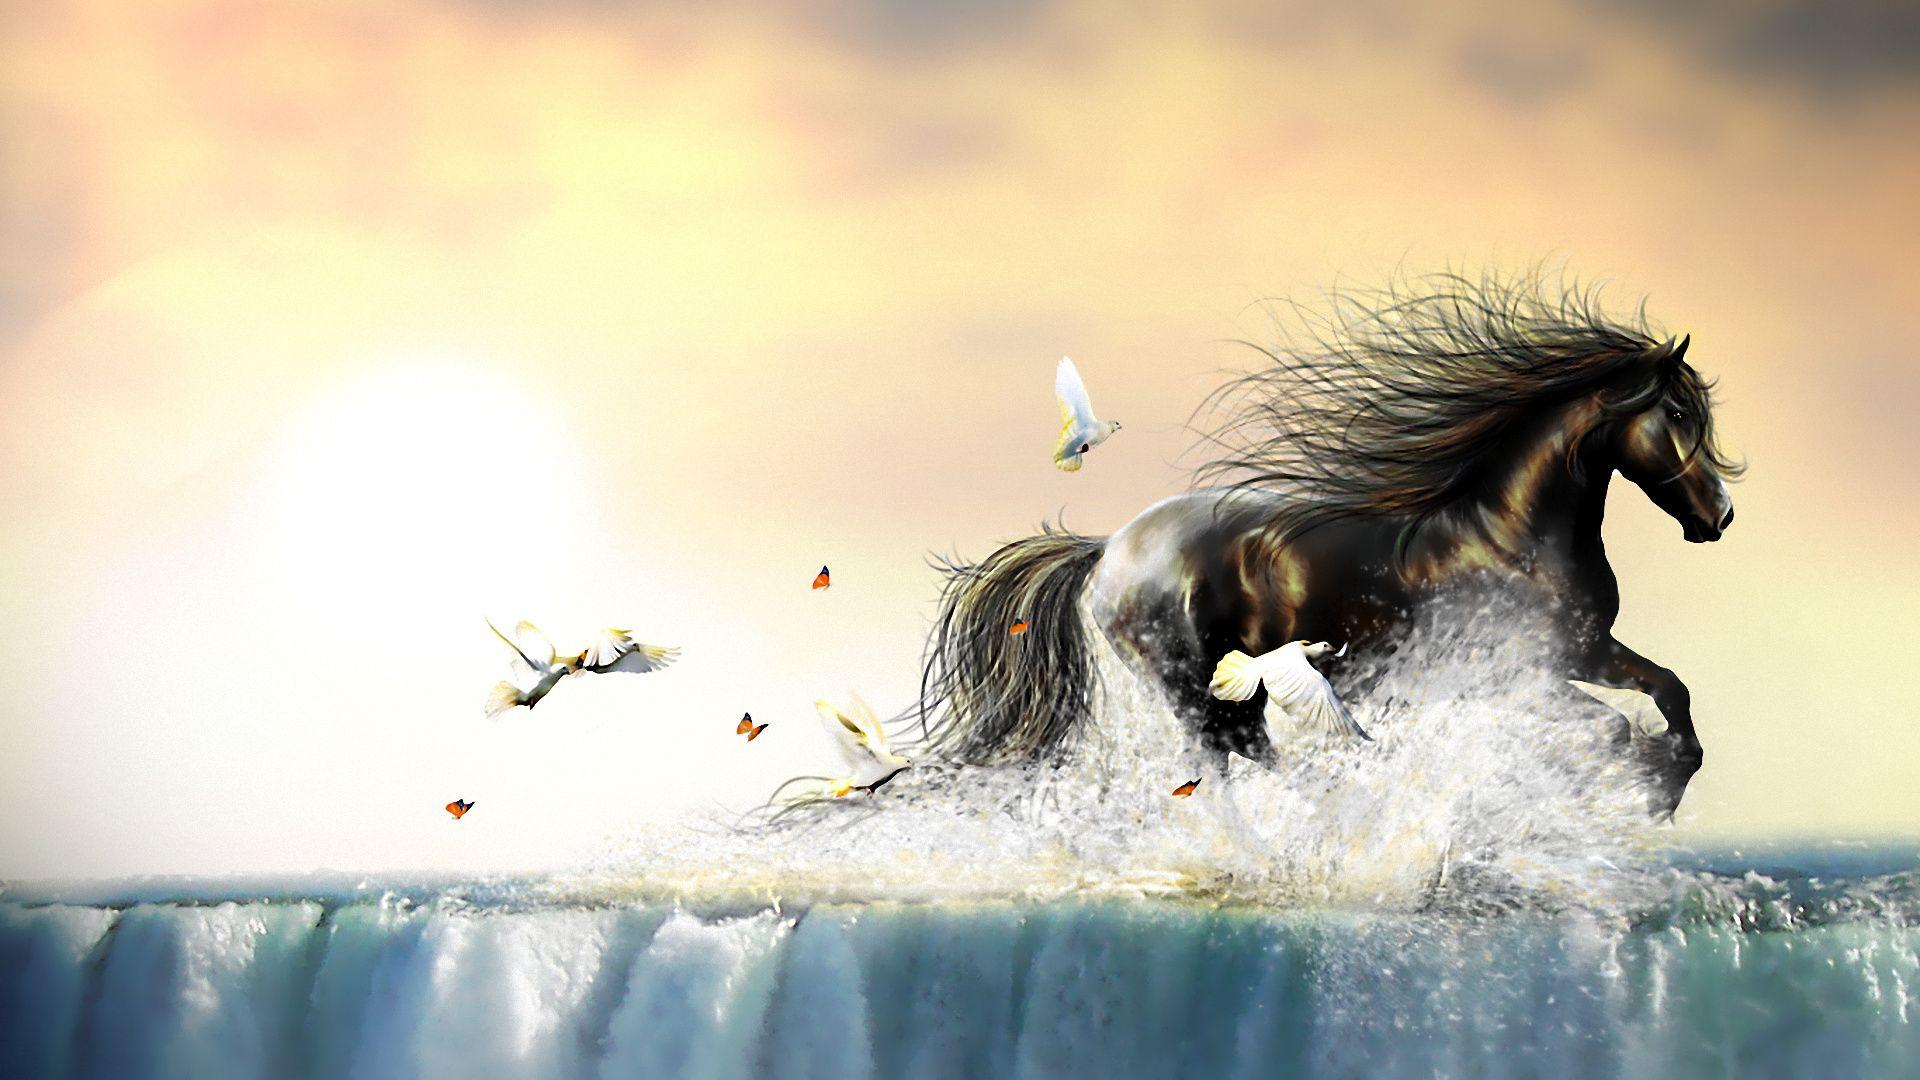 Best Wallpaper Horse Samsung Galaxy - f47ea2916fbd3614c35c2cfbc9fd29ab  Pic_89374.jpg